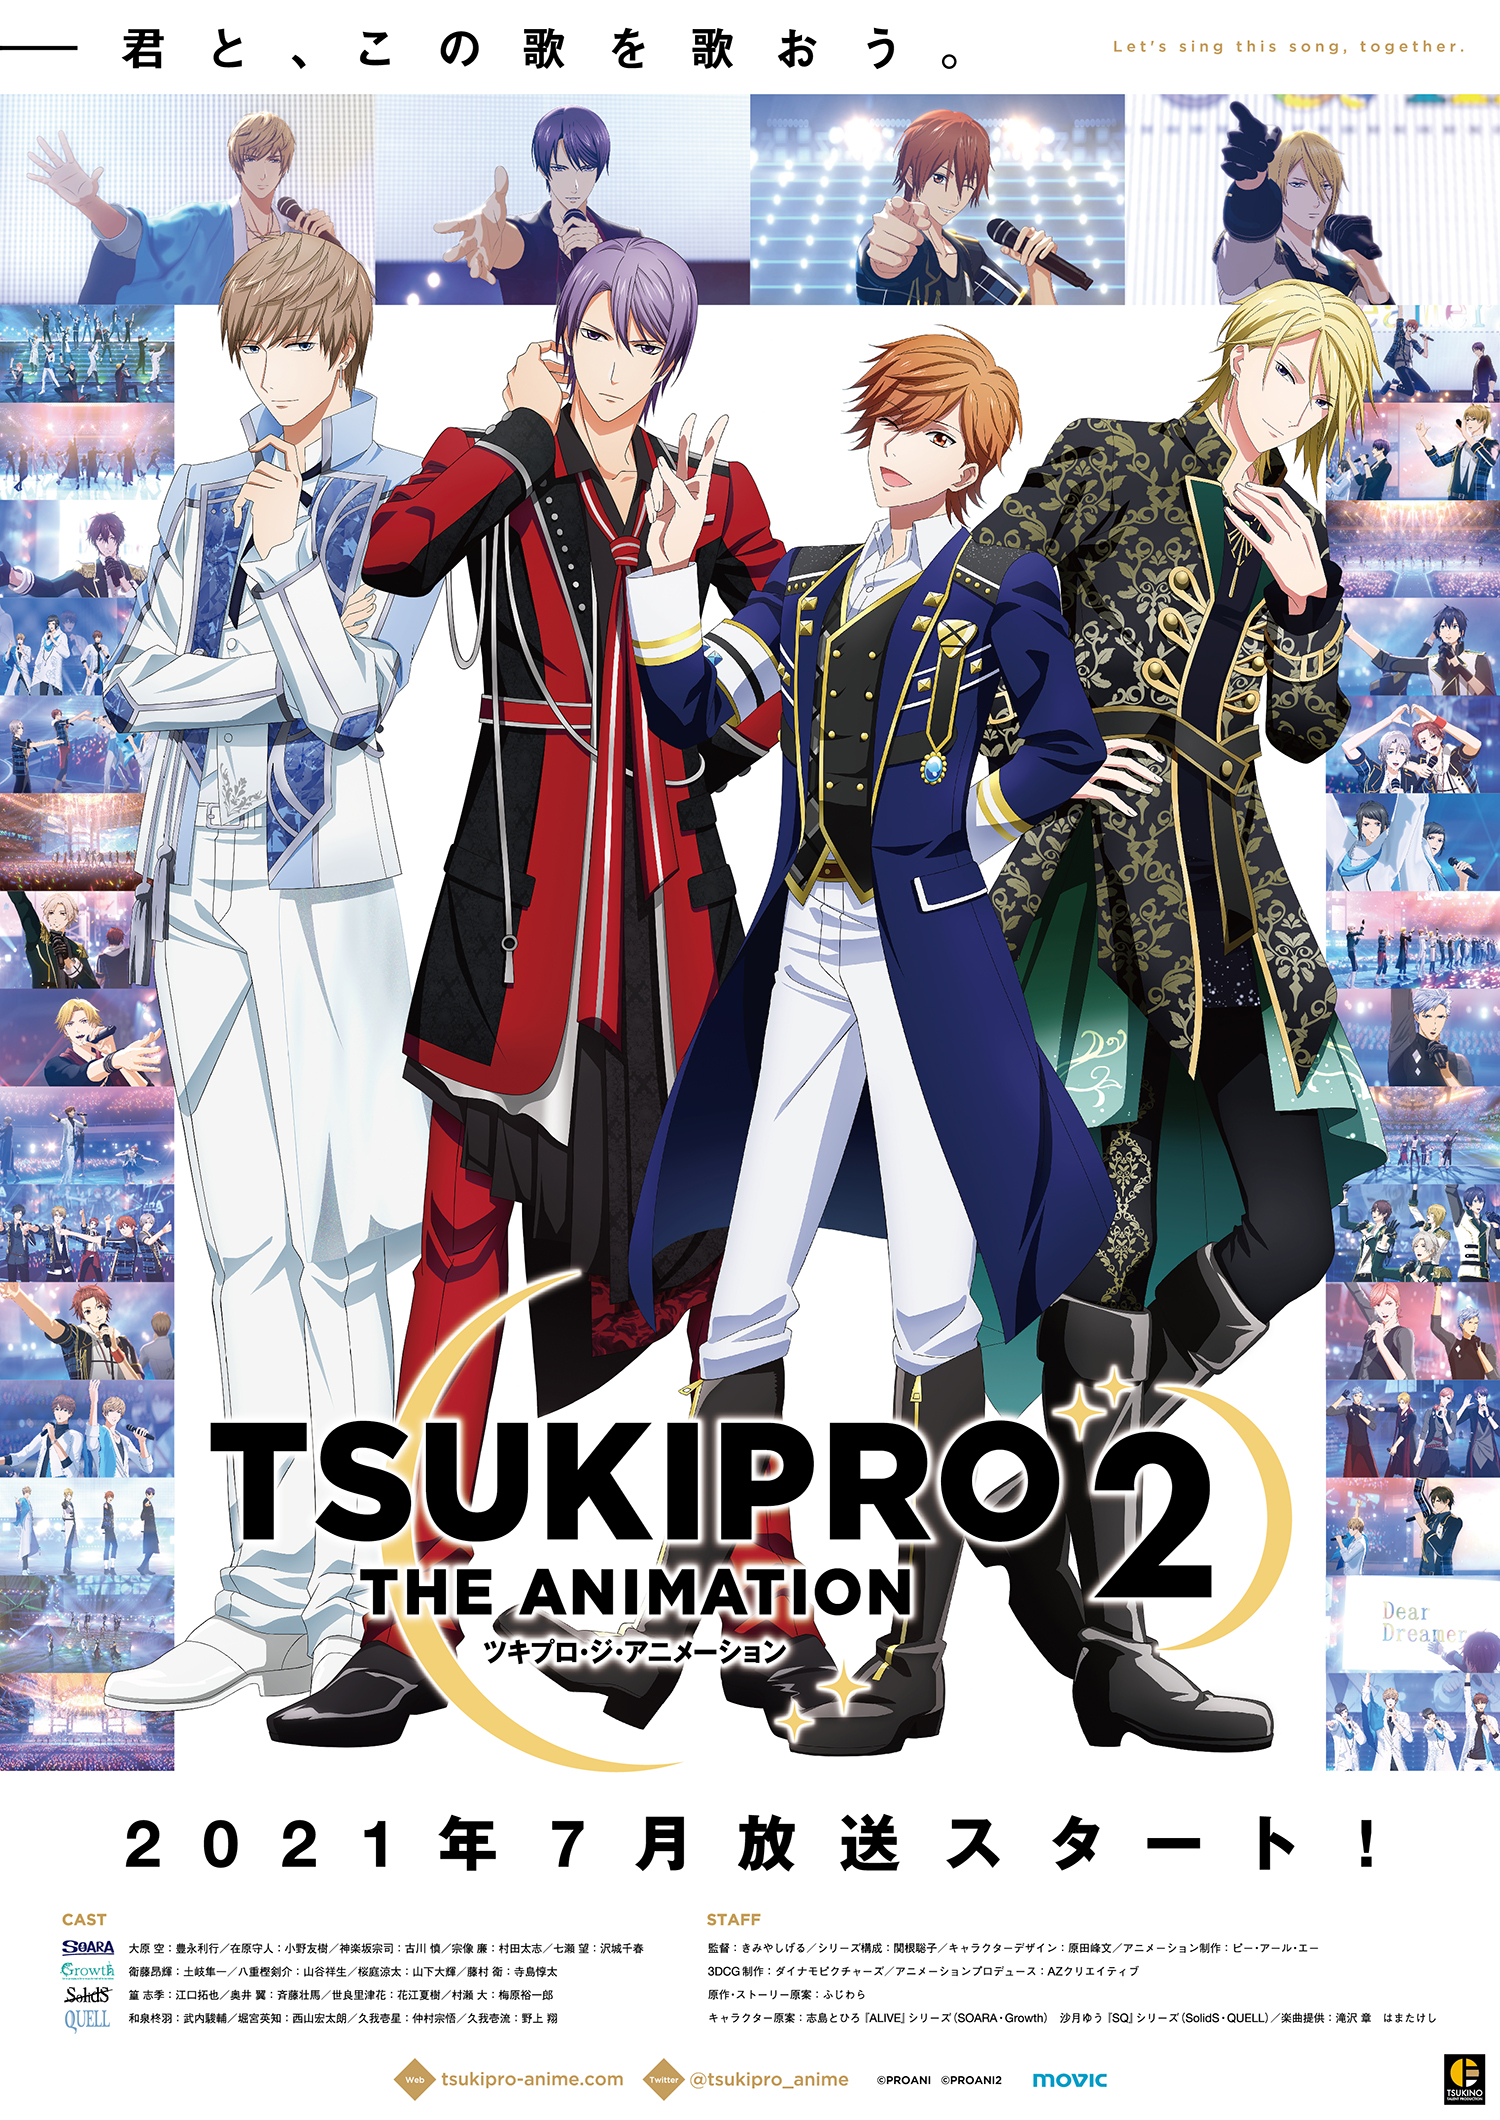 TVアニメ「プロアニ2」2021年7月放送決定!リーダー4人が集結したキービジュアル&各ユニットの主題歌試聴動画公開